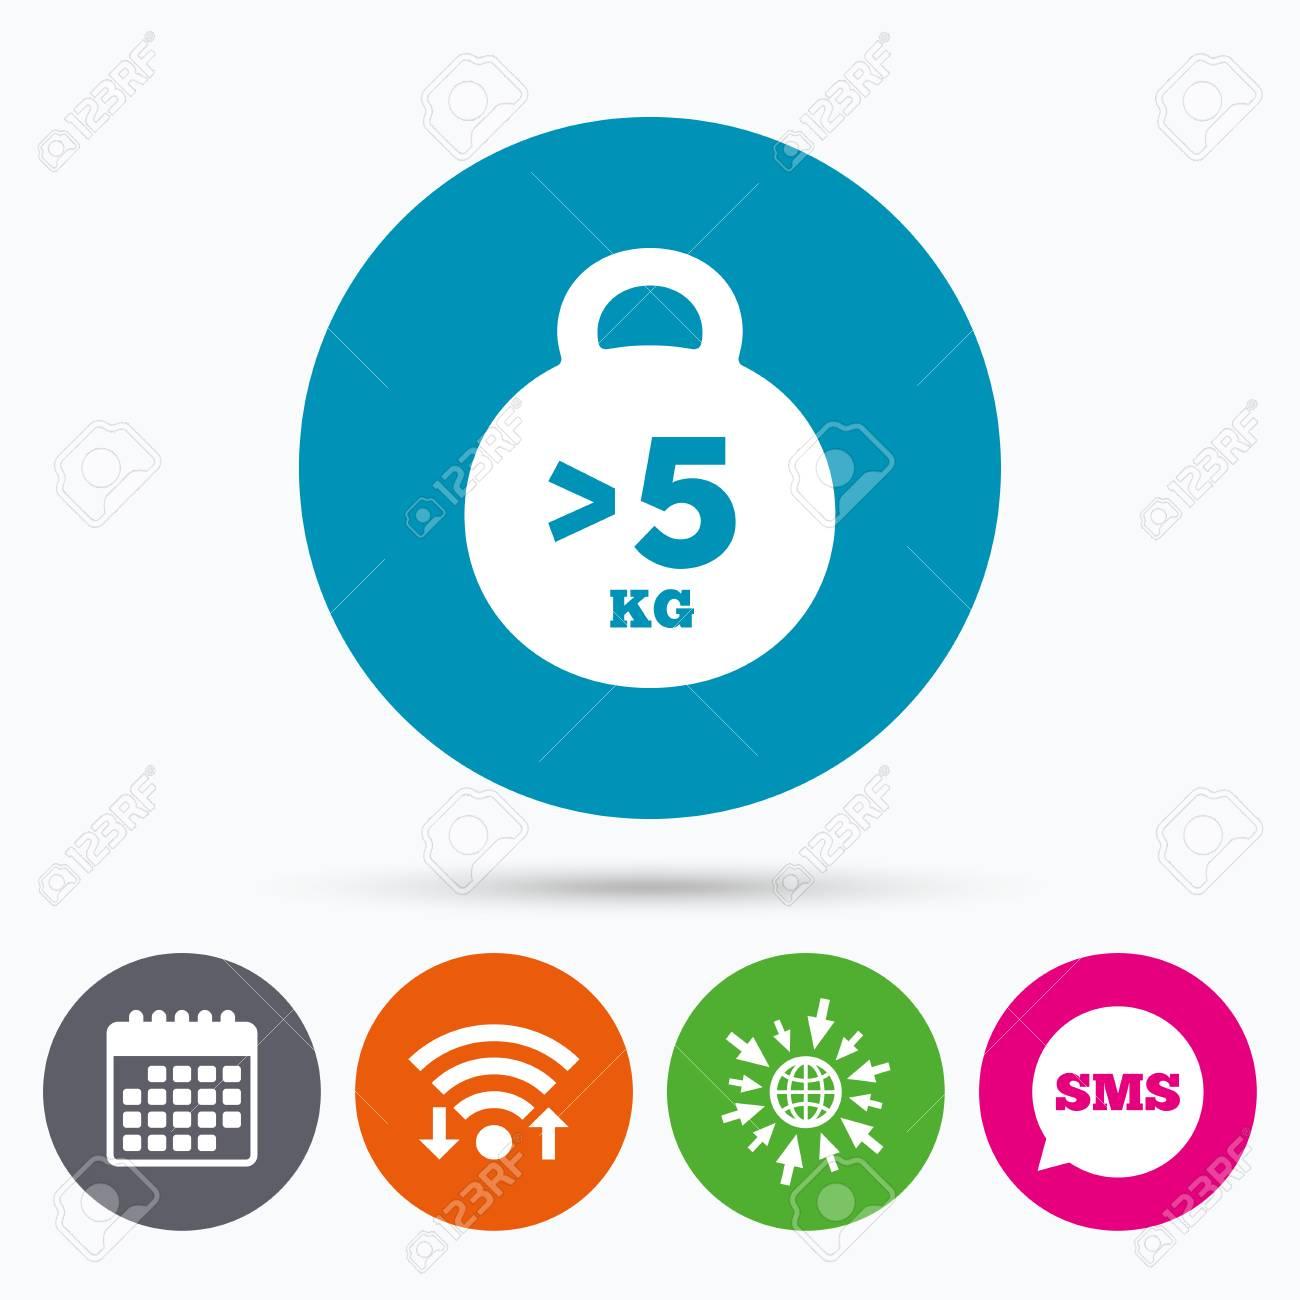 Calendario Icona.Wifi Sms E Calendario Icone Peso Segno Icona Piu Di 5 Kg Kg Simbolo Sport Fitness Vai A Web Globo